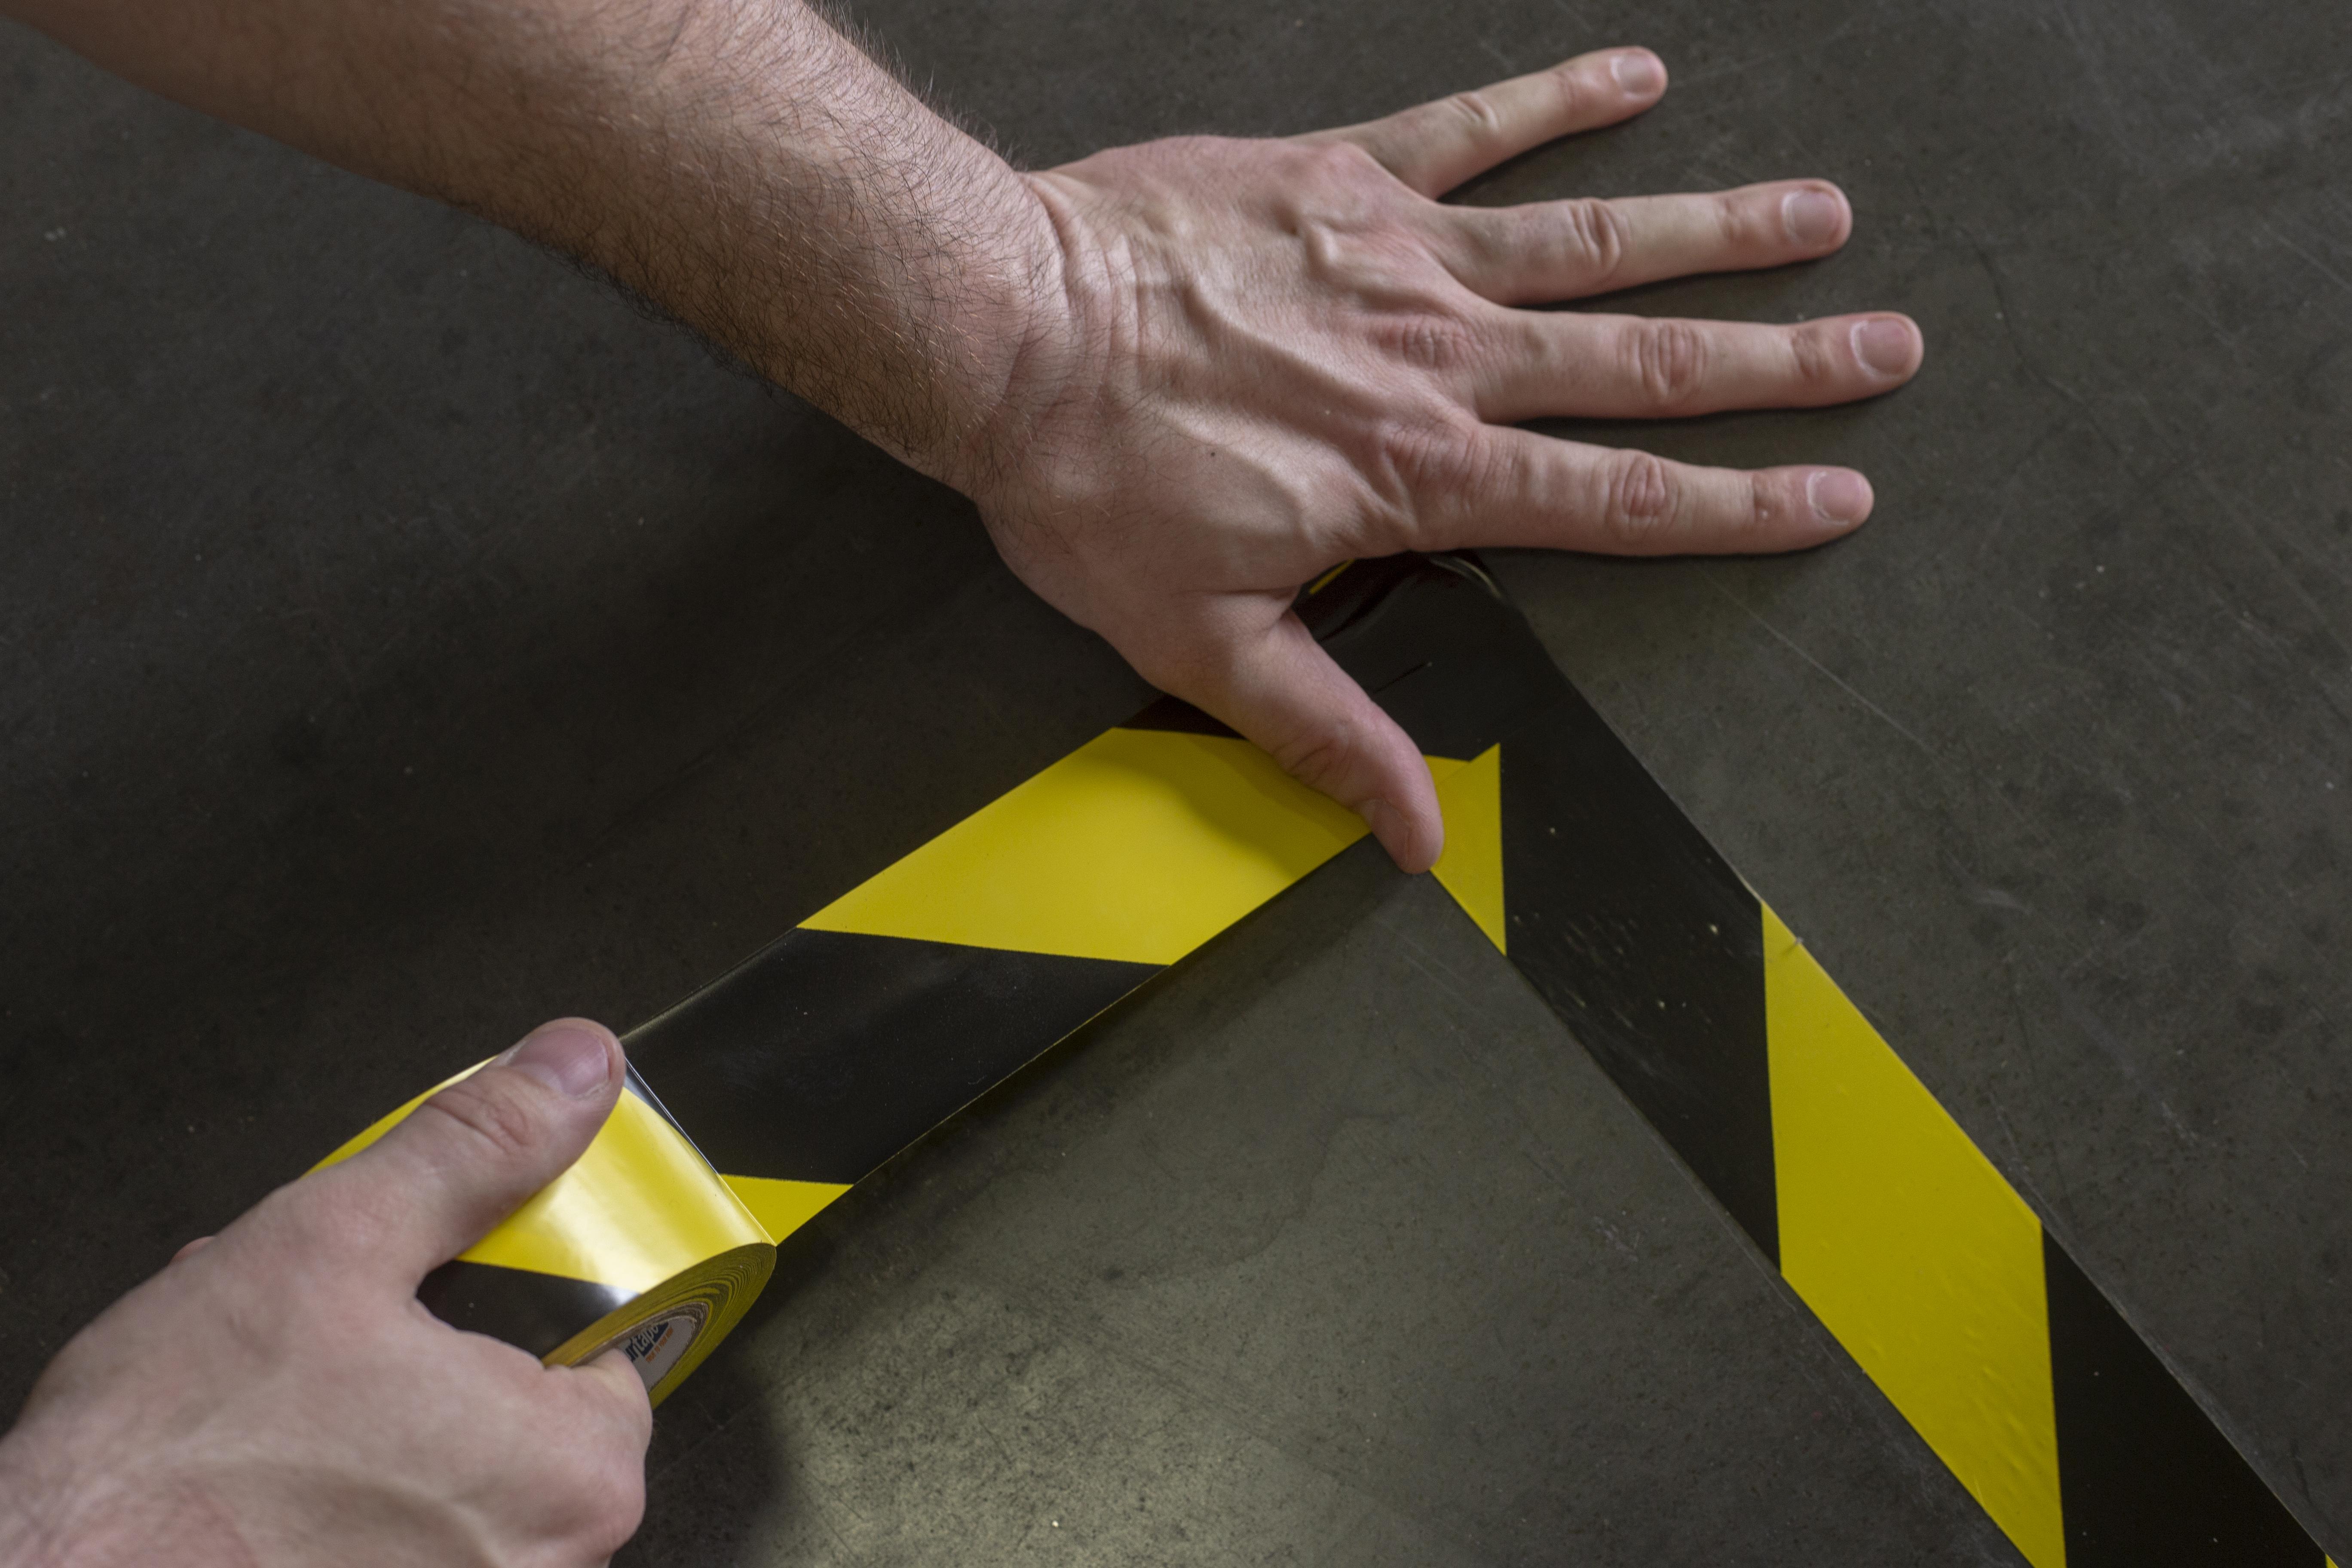 Floor Marking Tape for Social Distancing Lanes 1